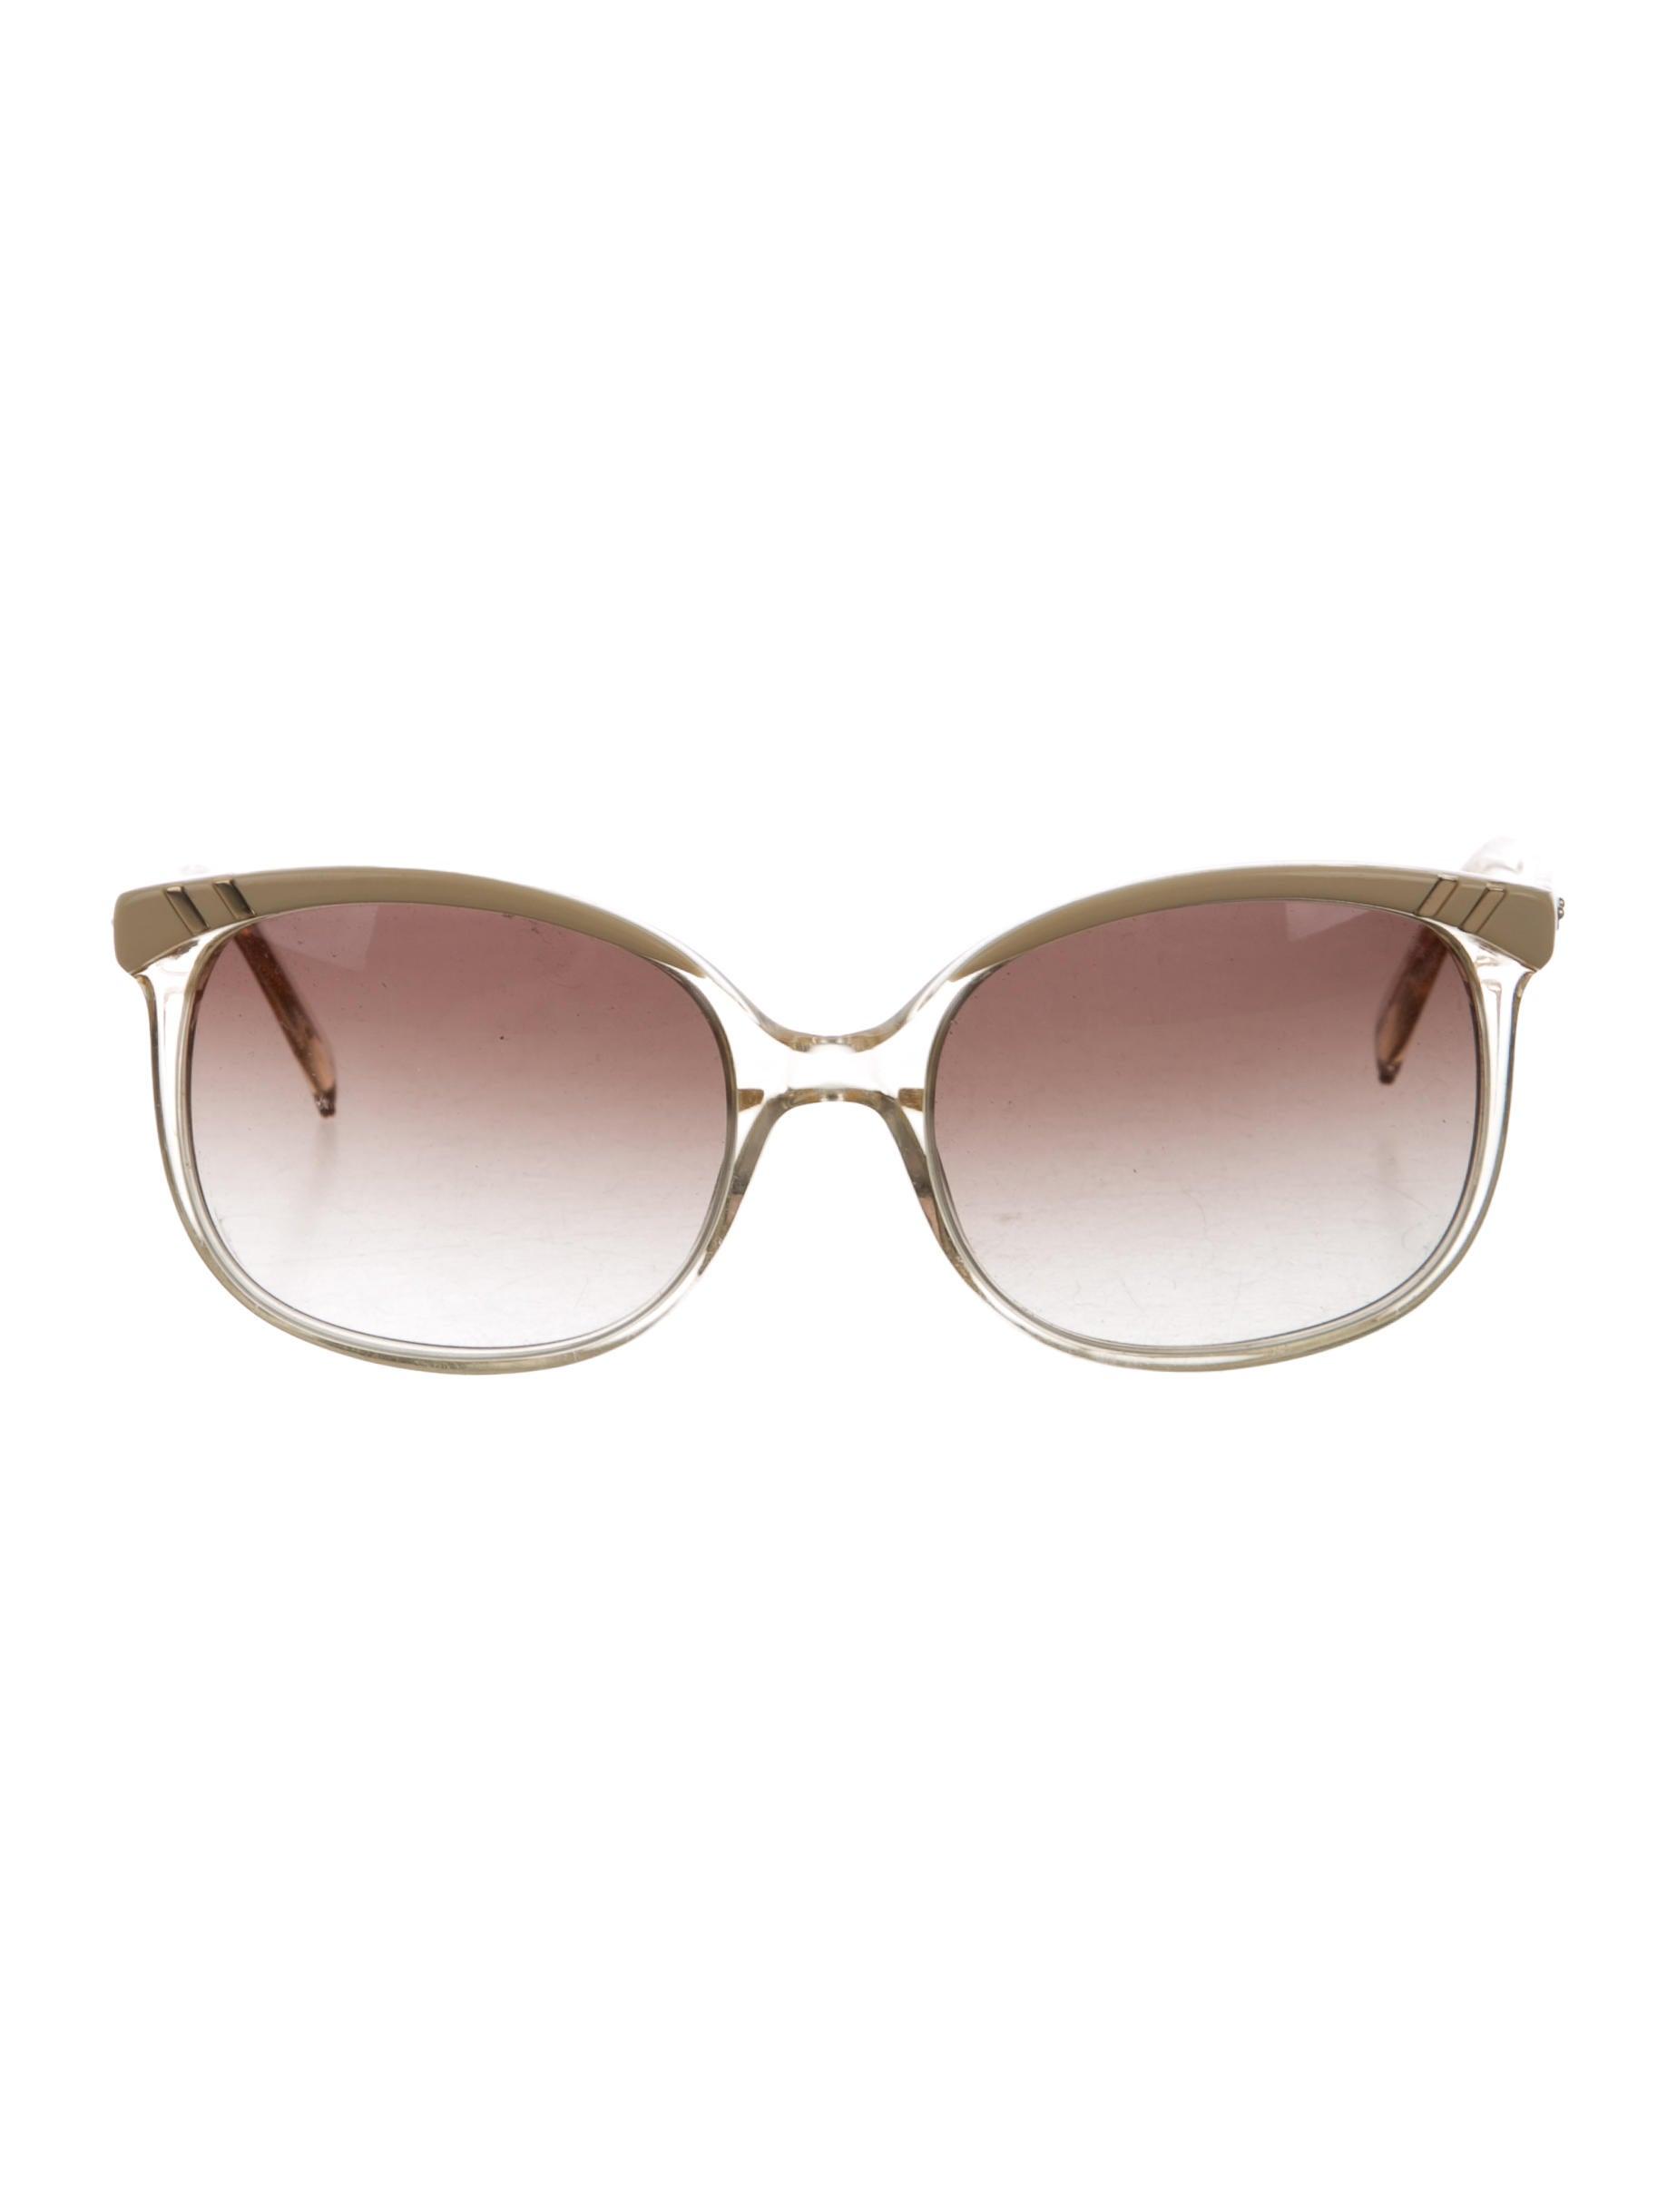 5ea930e00f54 Chloe Square Sunglasses